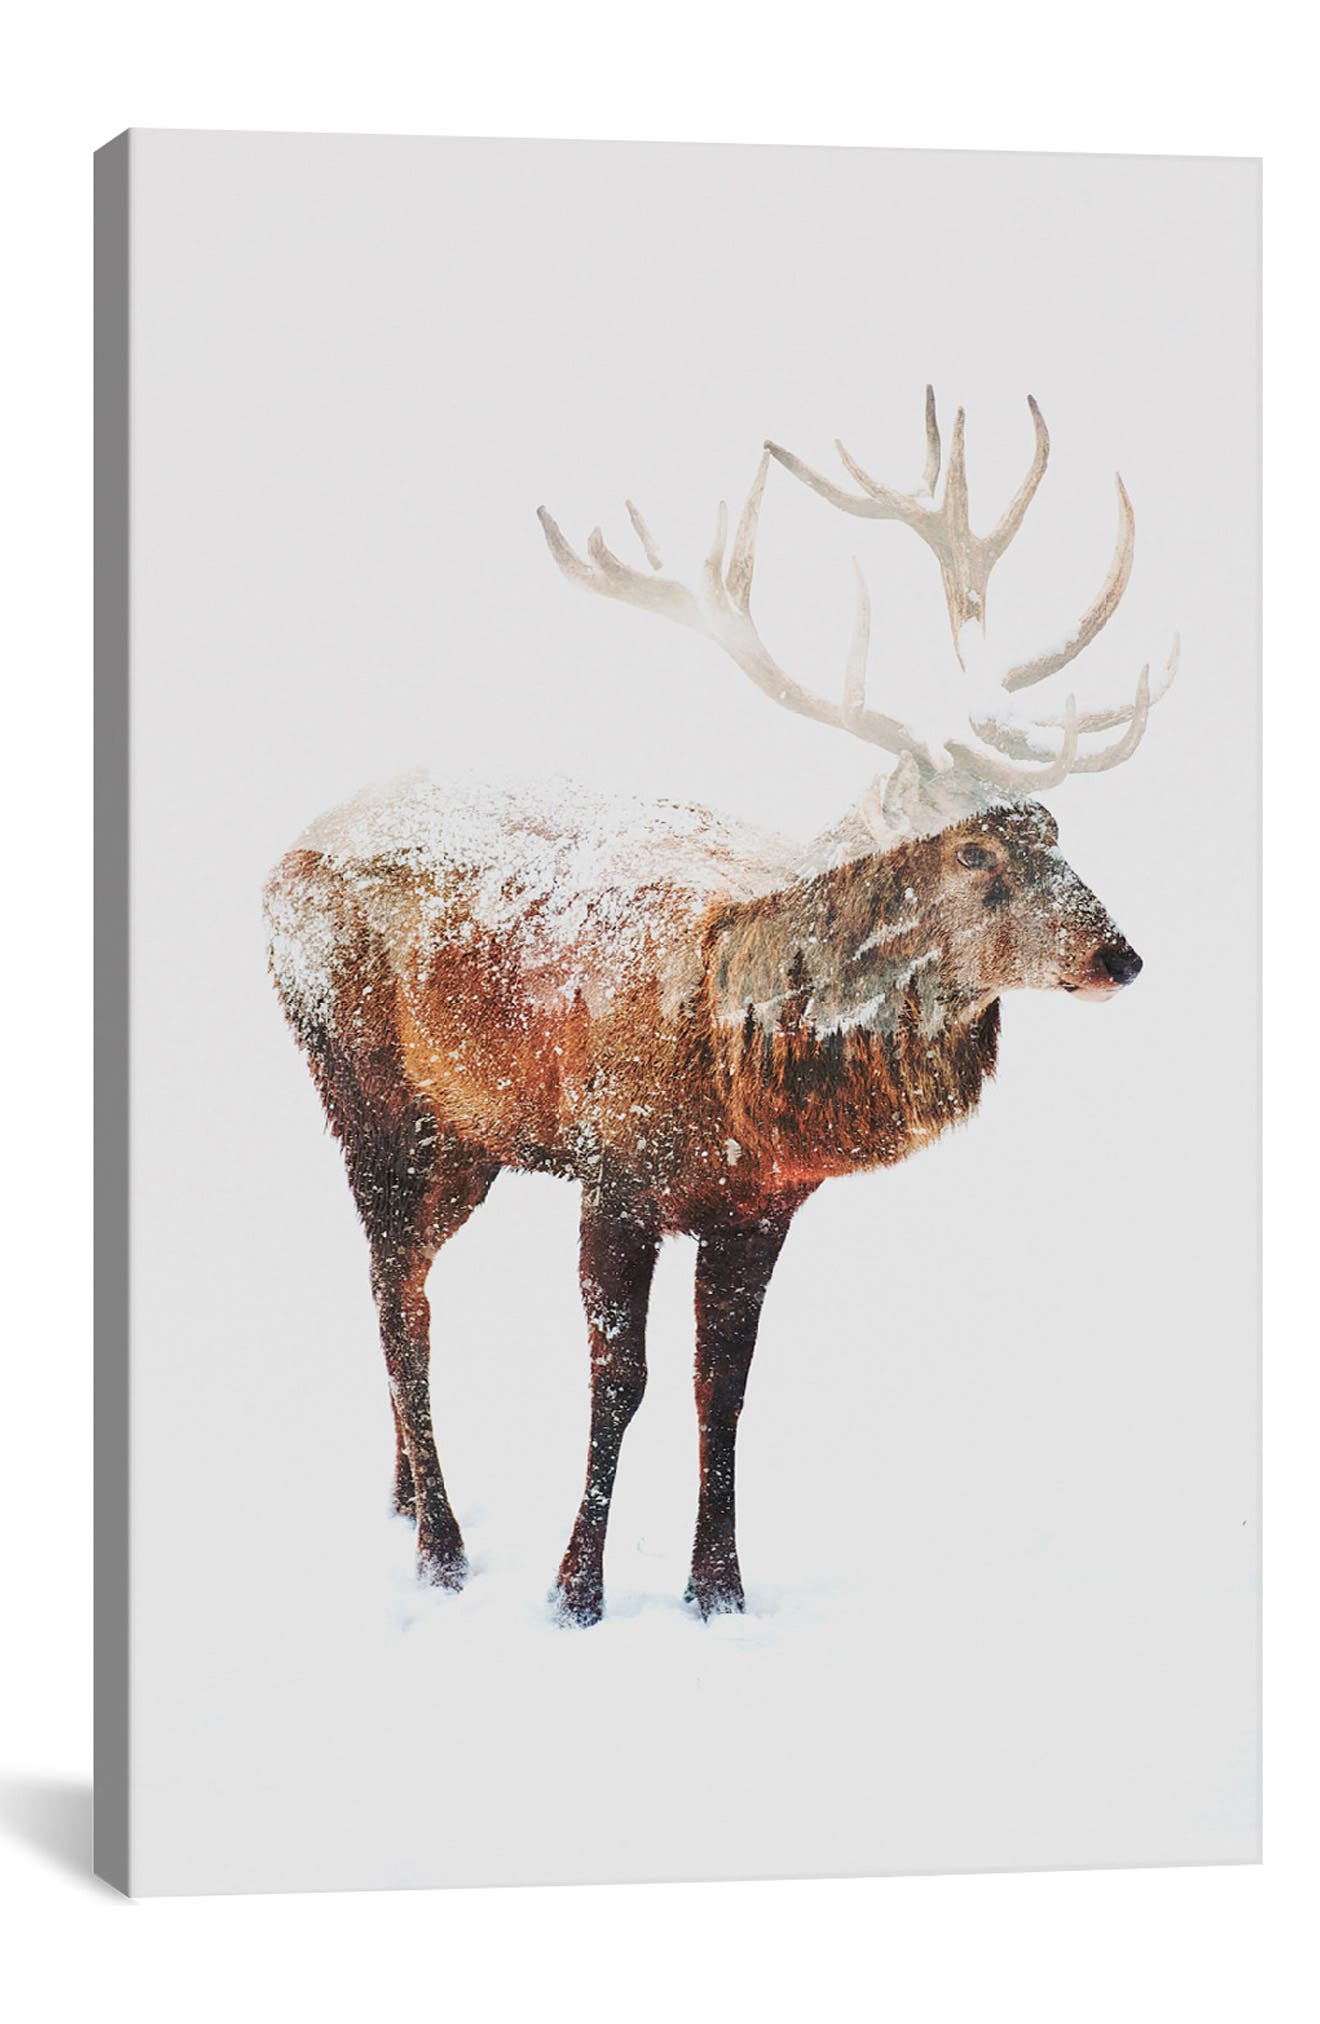 'Deer V' Giclée Print Canvas Art,                             Alternate thumbnail 3, color,                             200